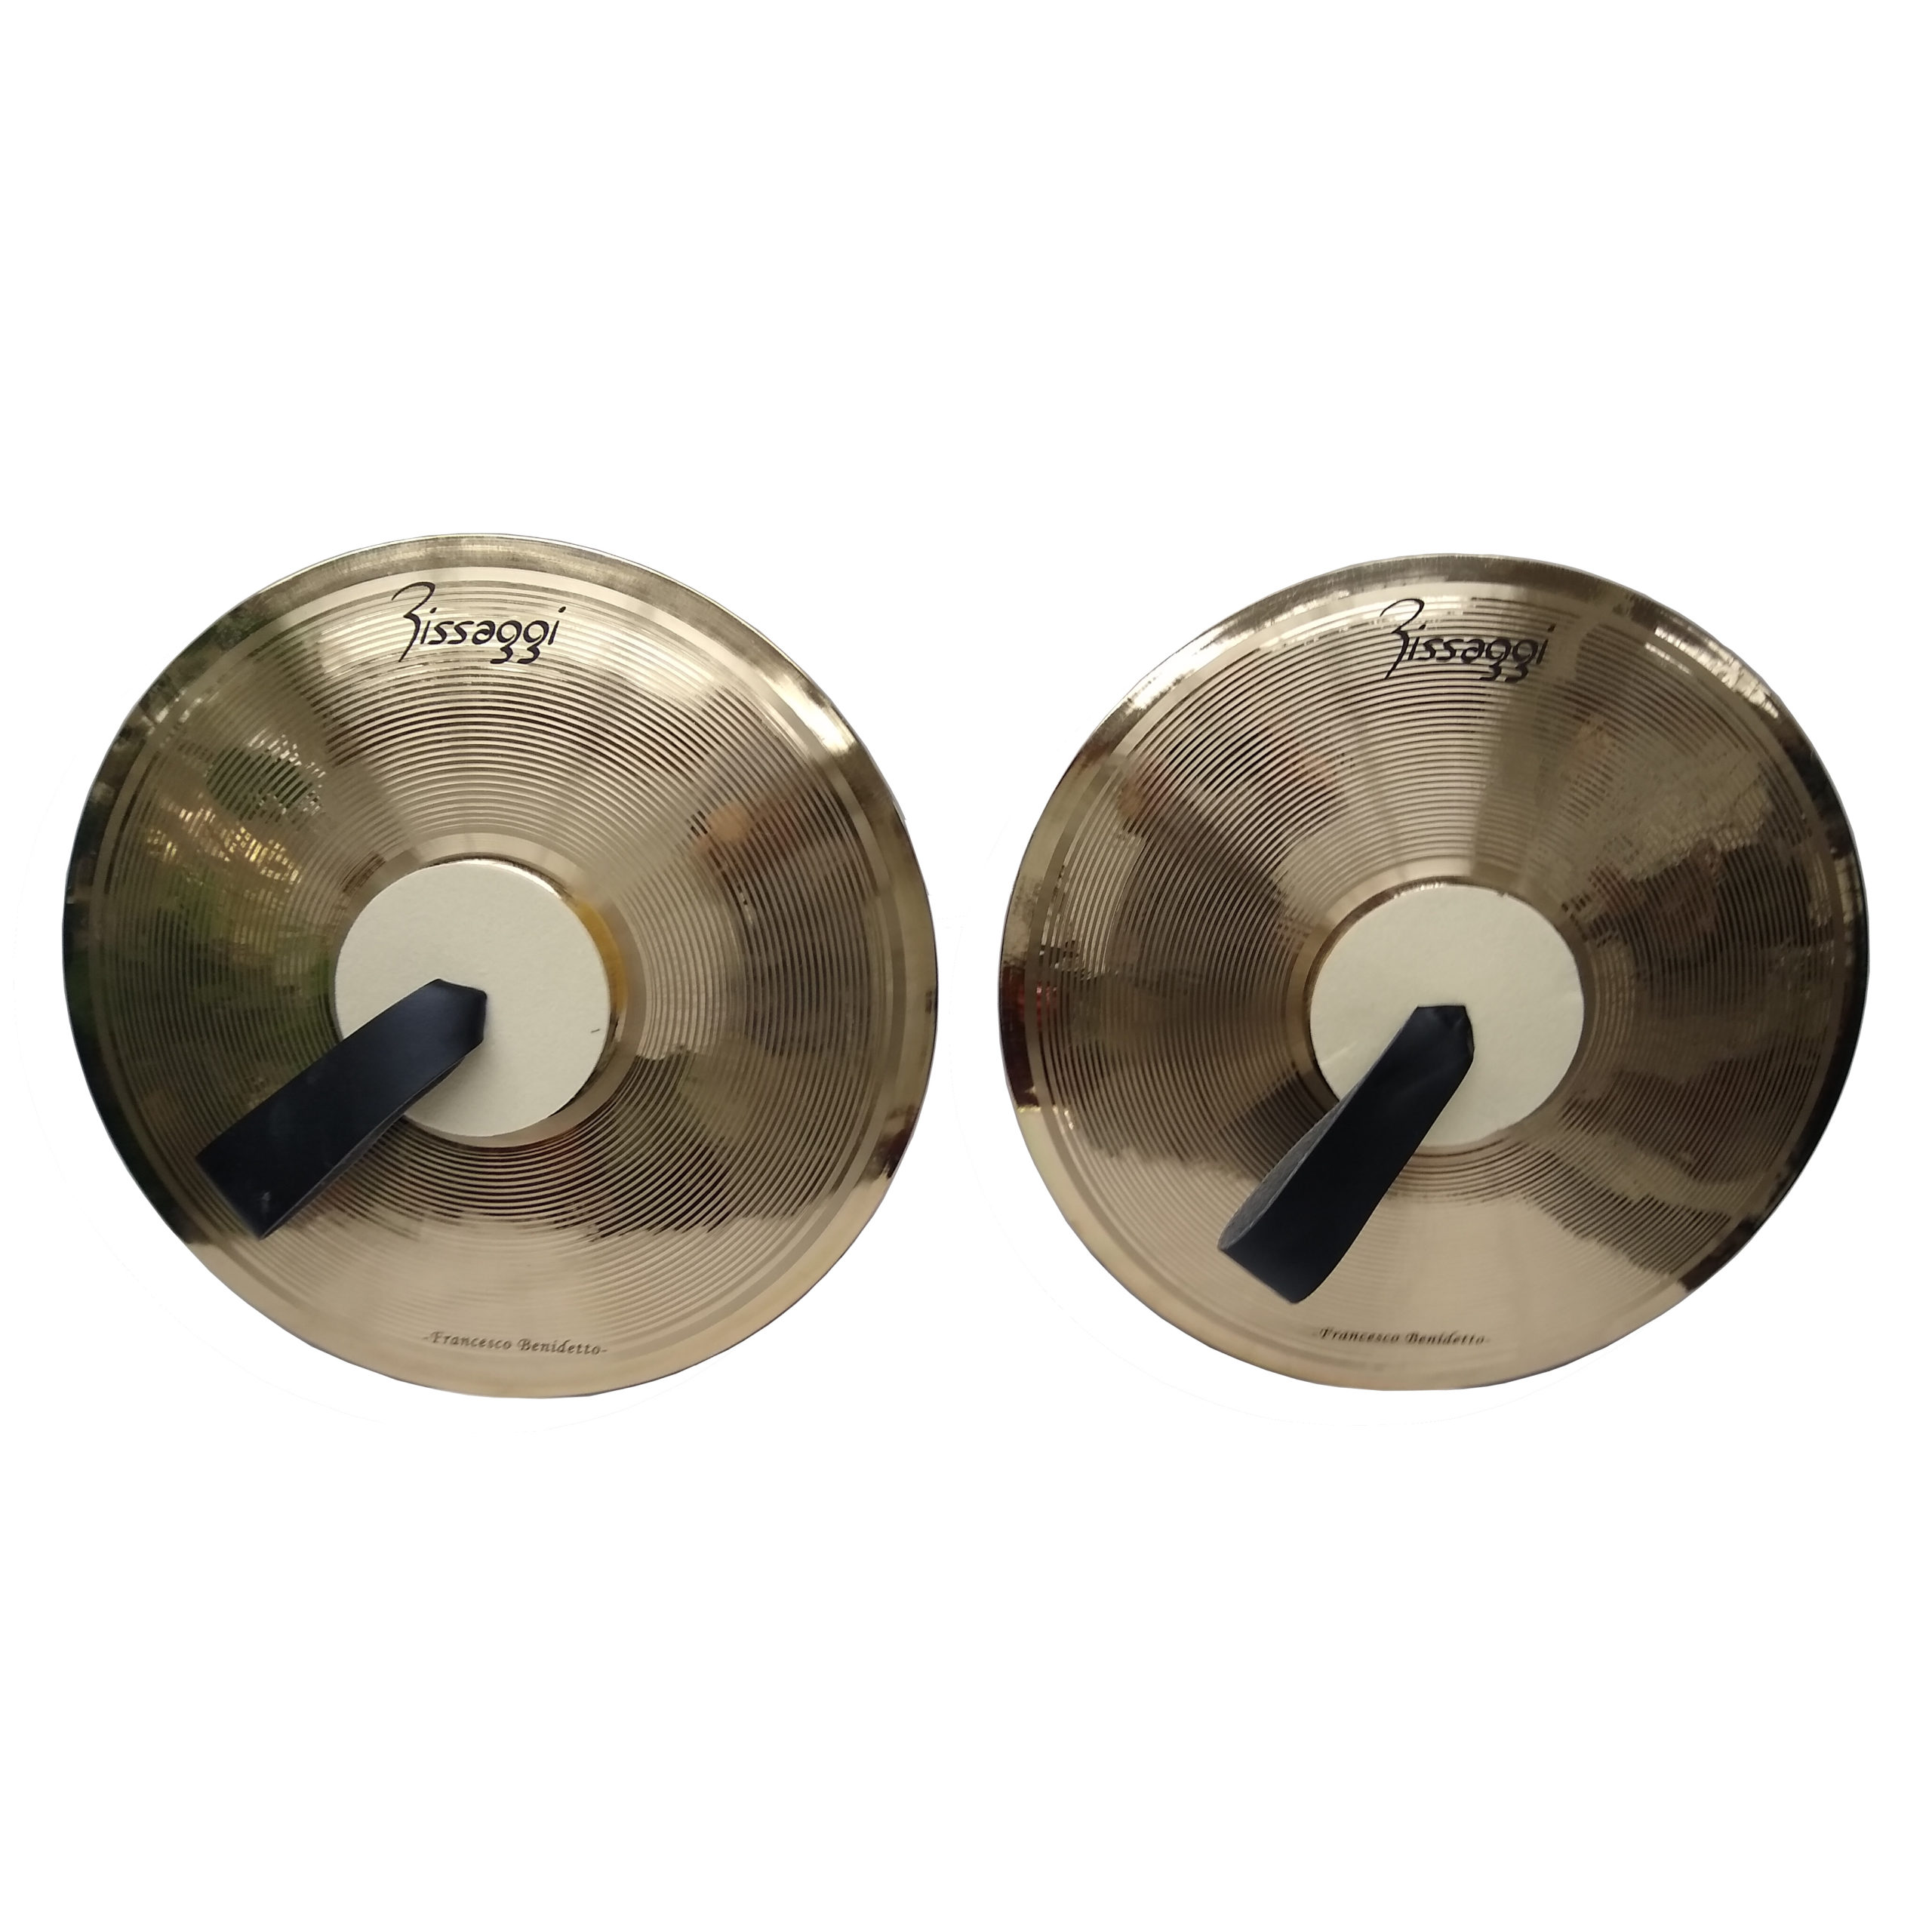 Fissaggi Field Series Marching Cymbals 15